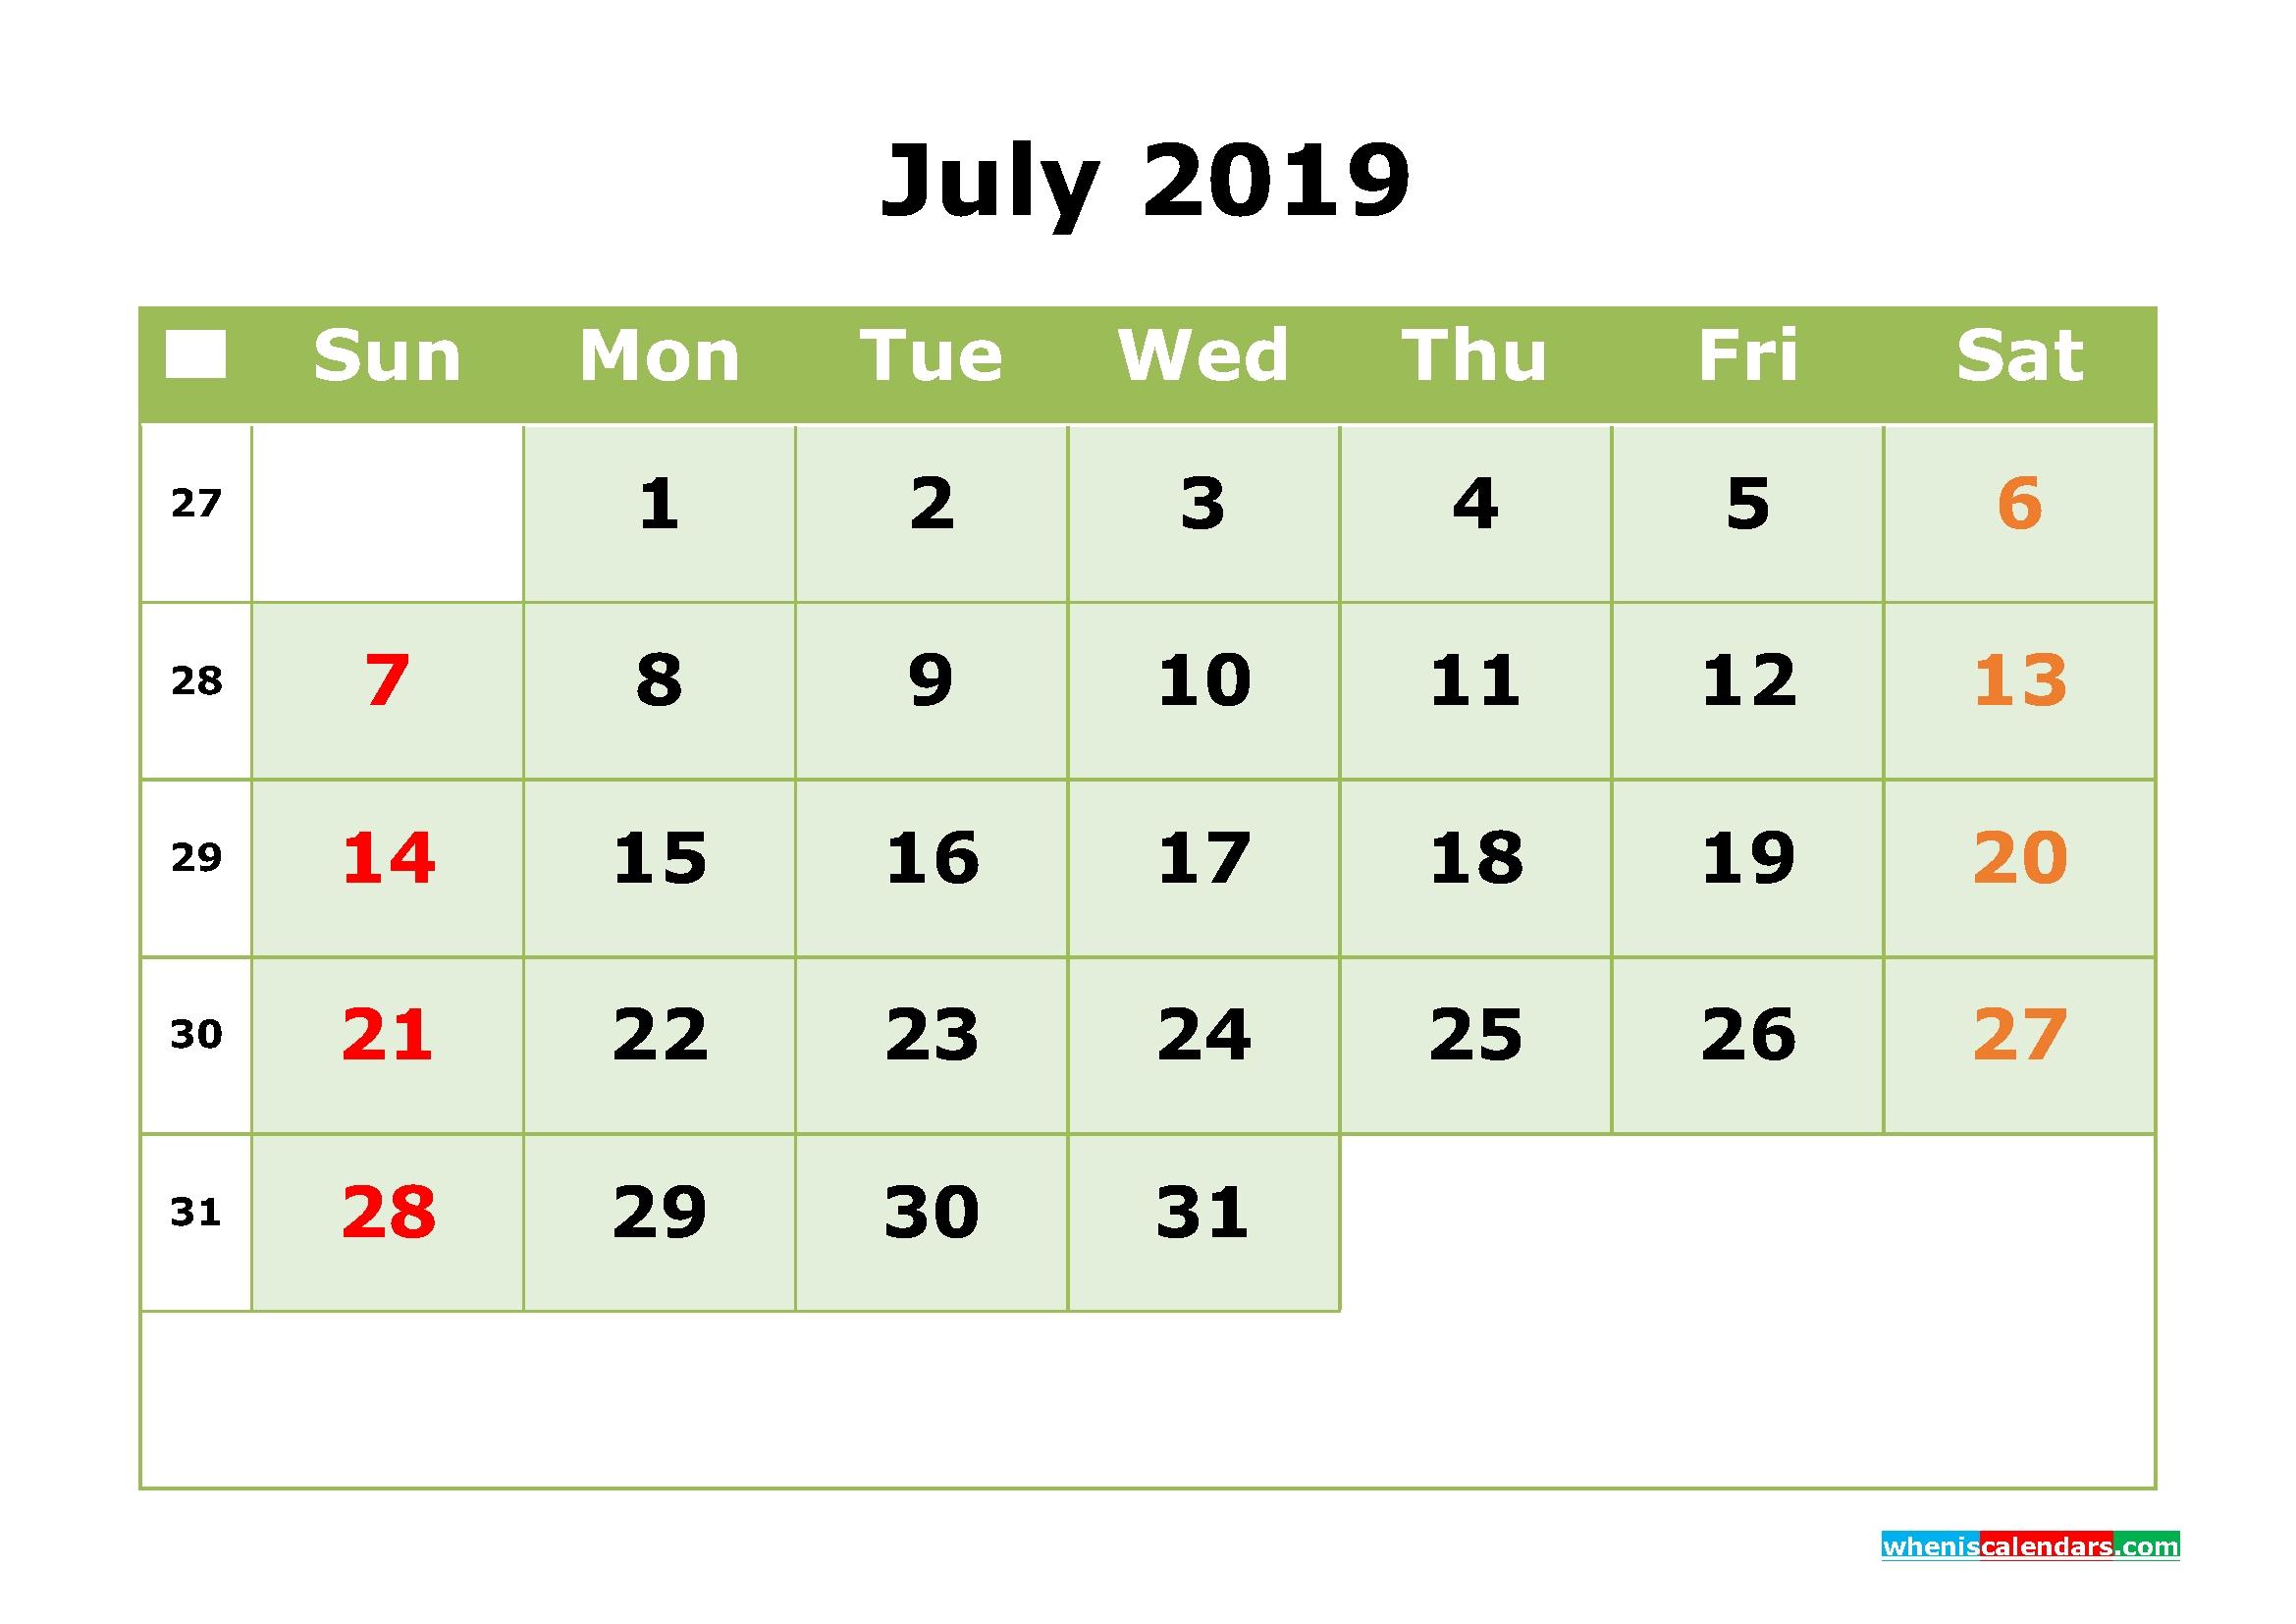 July 2019 Printable Calendar Month By Month Calendar